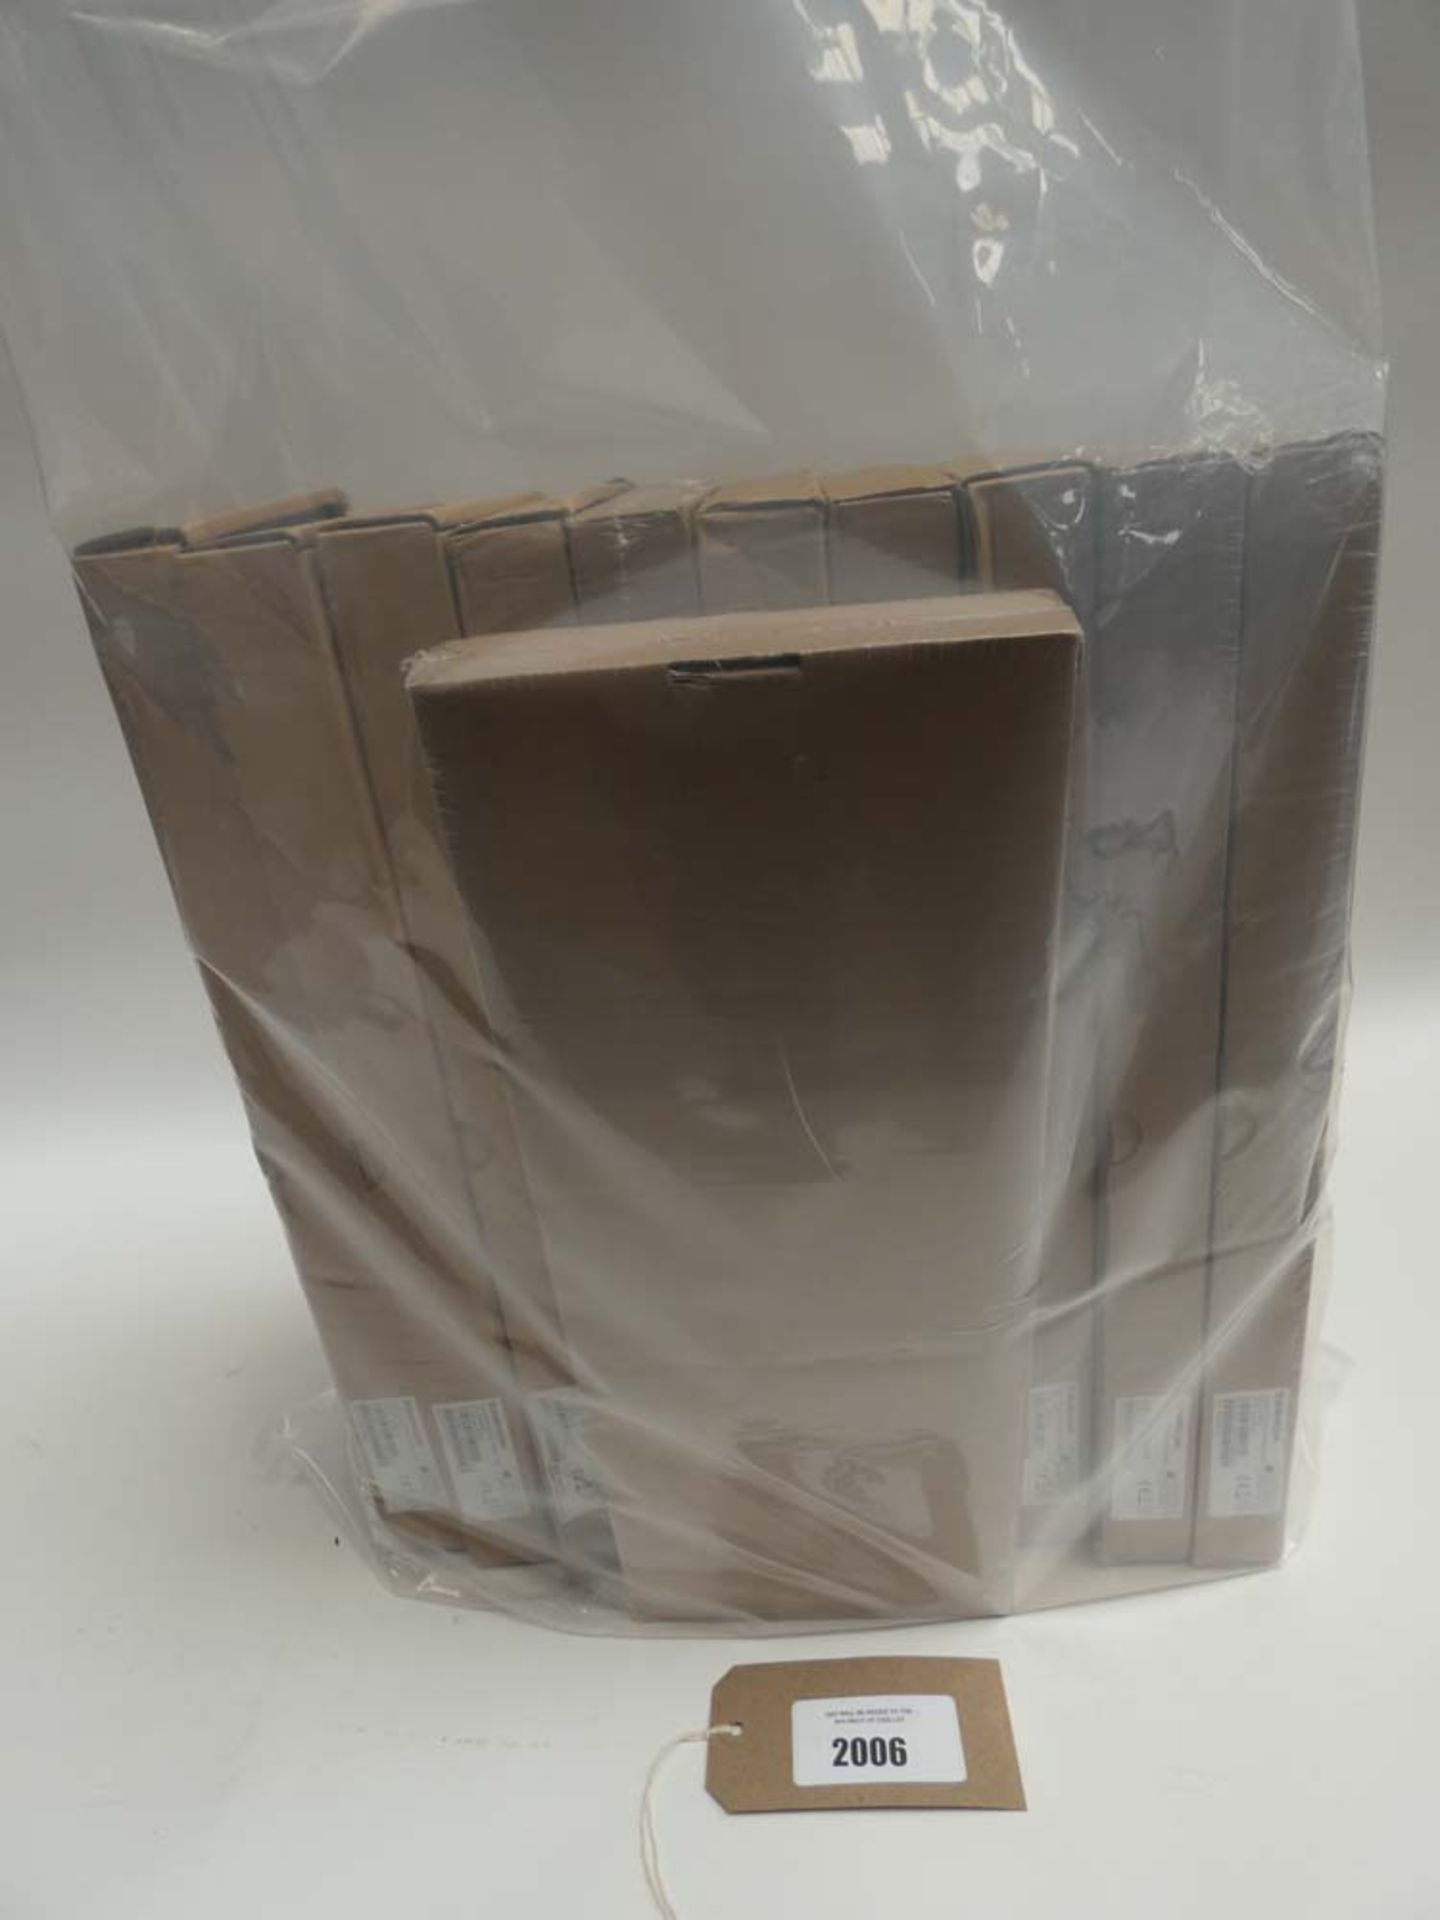 Lot 2006 - Bag containing 11x Sagecom routers